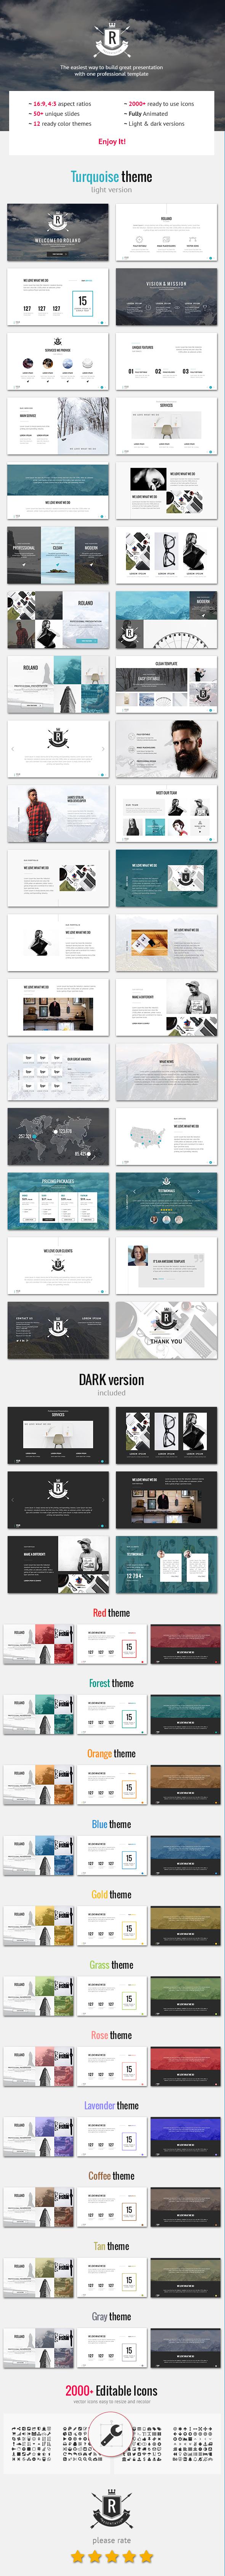 Roland – Premium Photo-based Template - PowerPoint Templates Presentation Templates